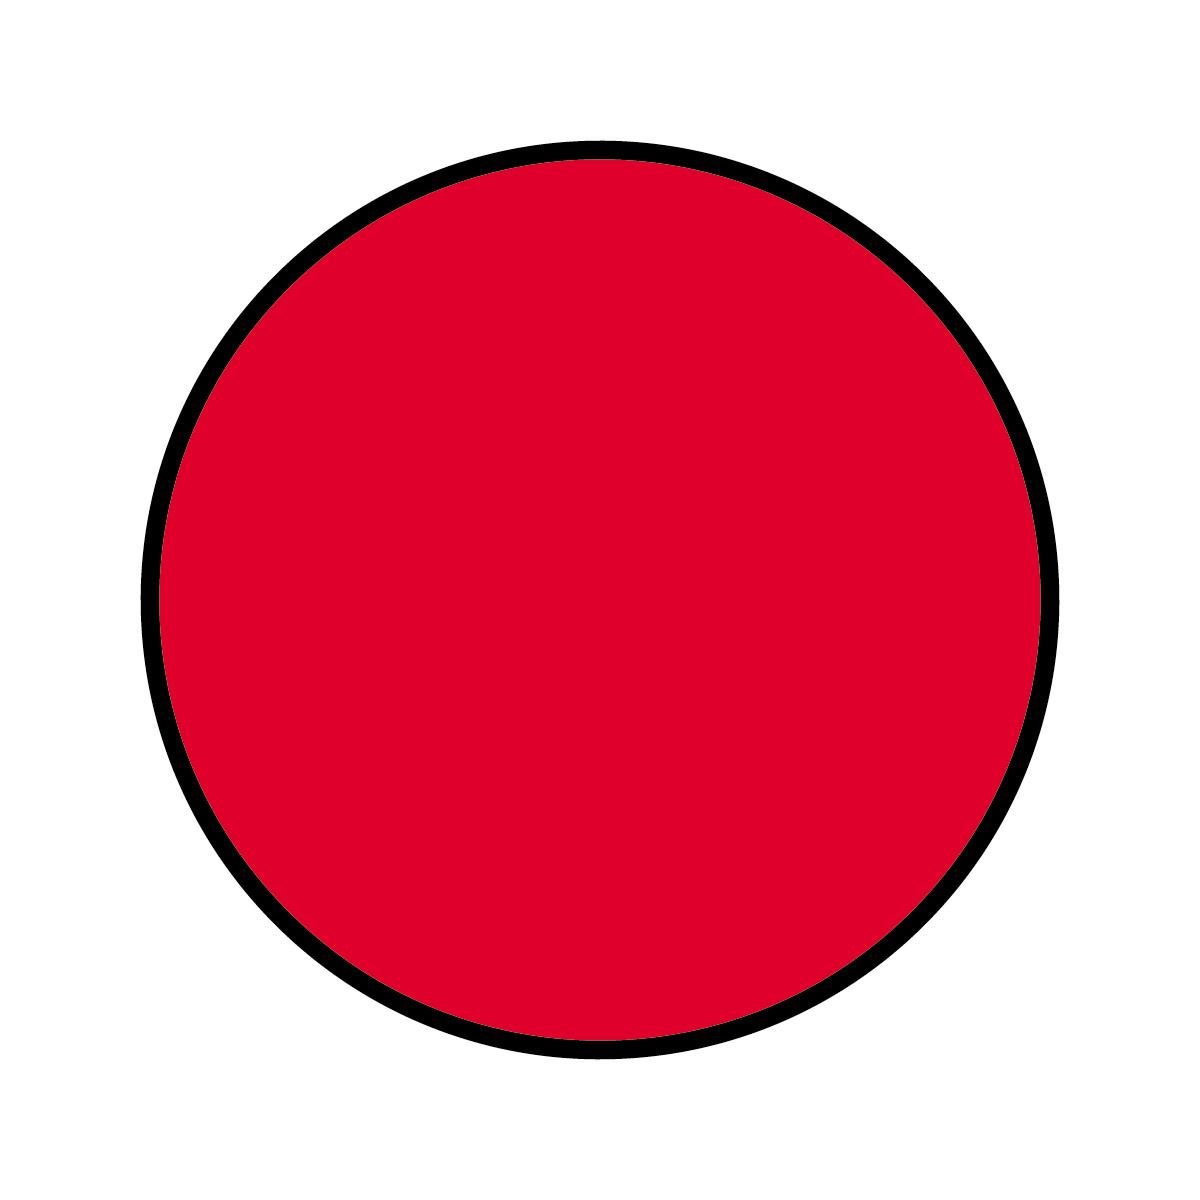 1200x1200 Free Circle Clipart Image